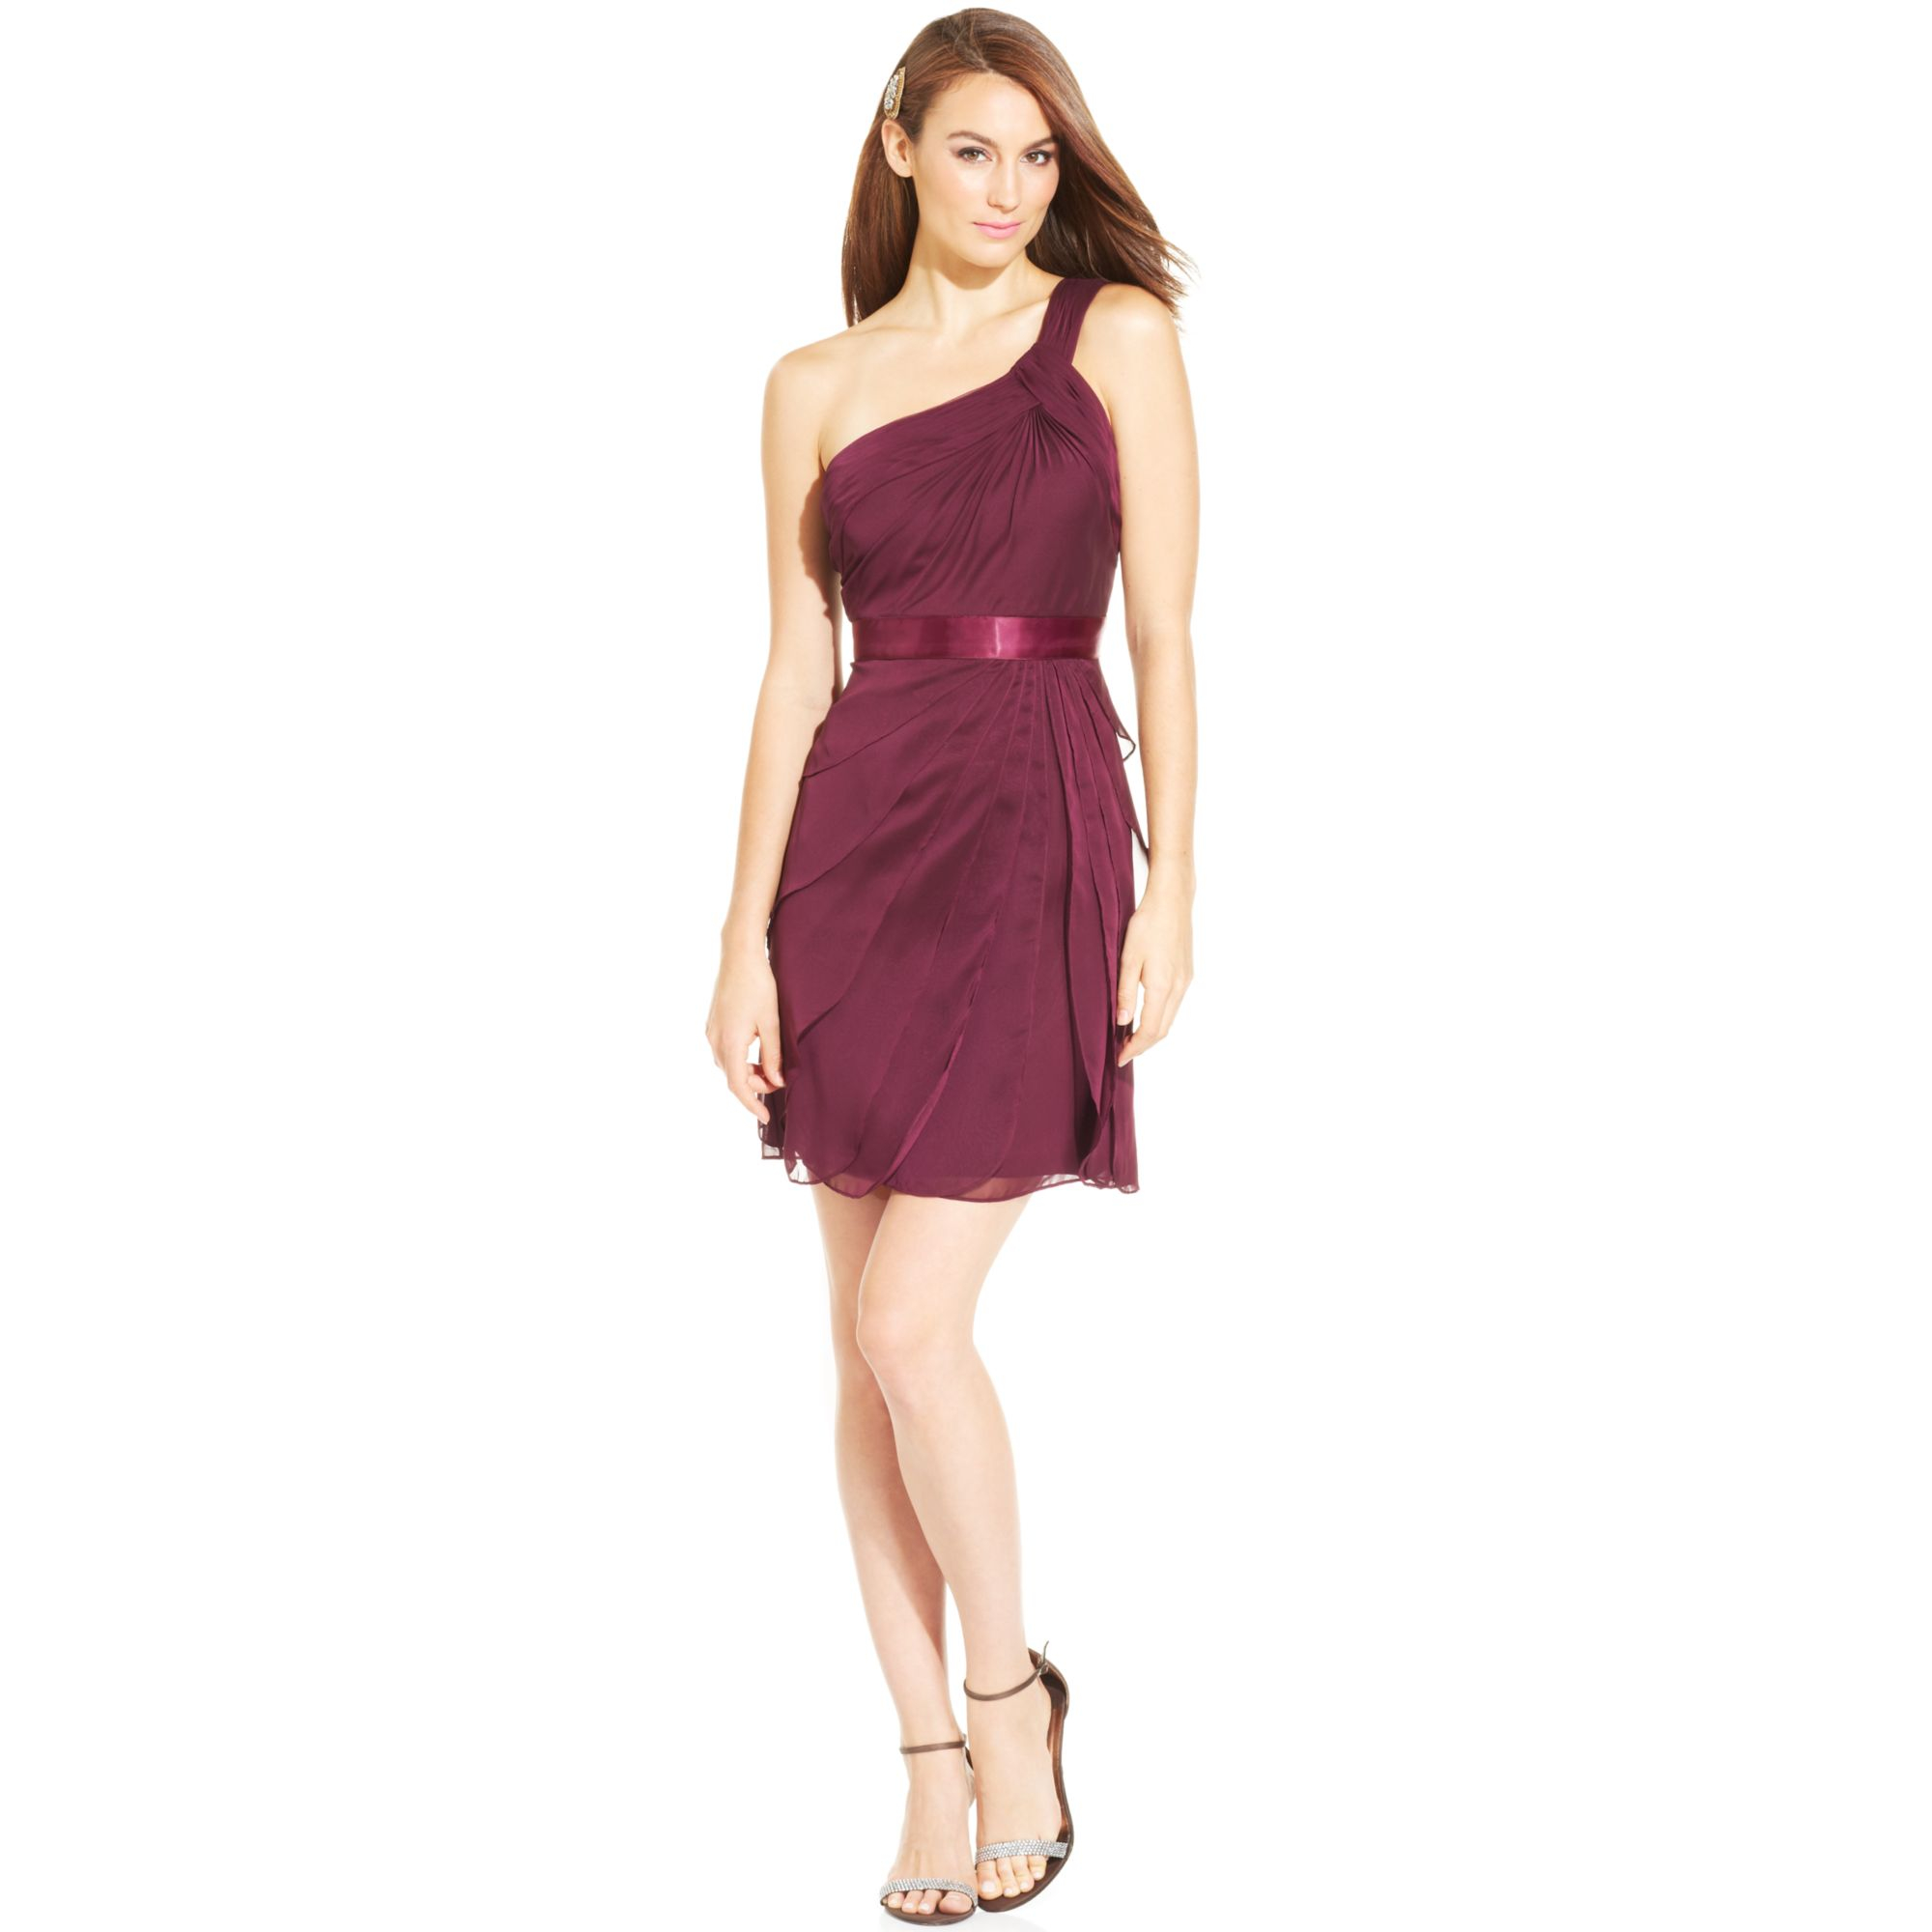 Galerry macy s slip dress